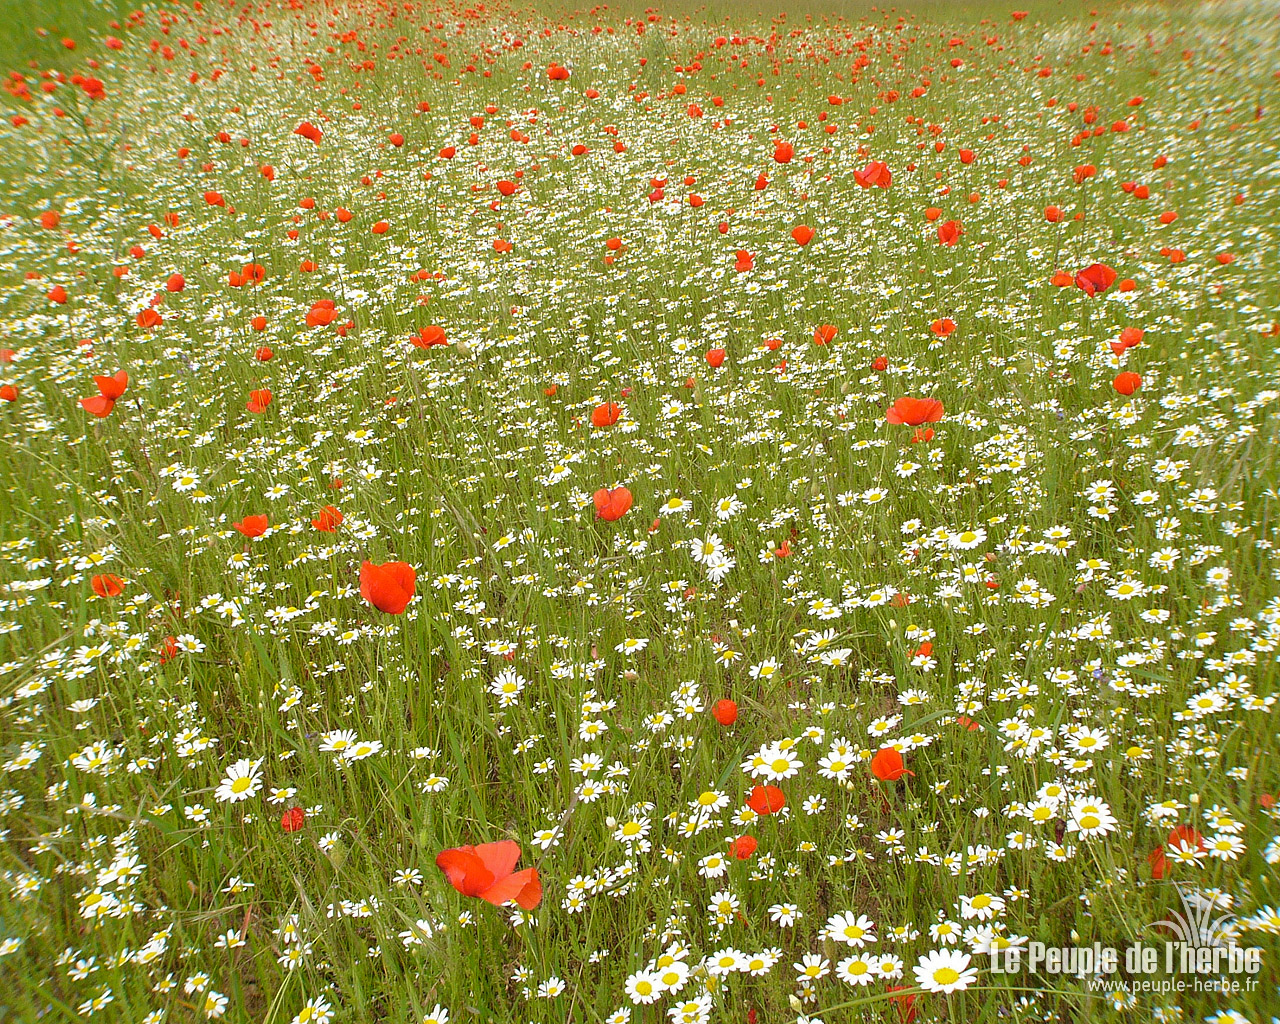 Tags fonds d'écran 1280x1024 écrans wallpaper fleurs nature